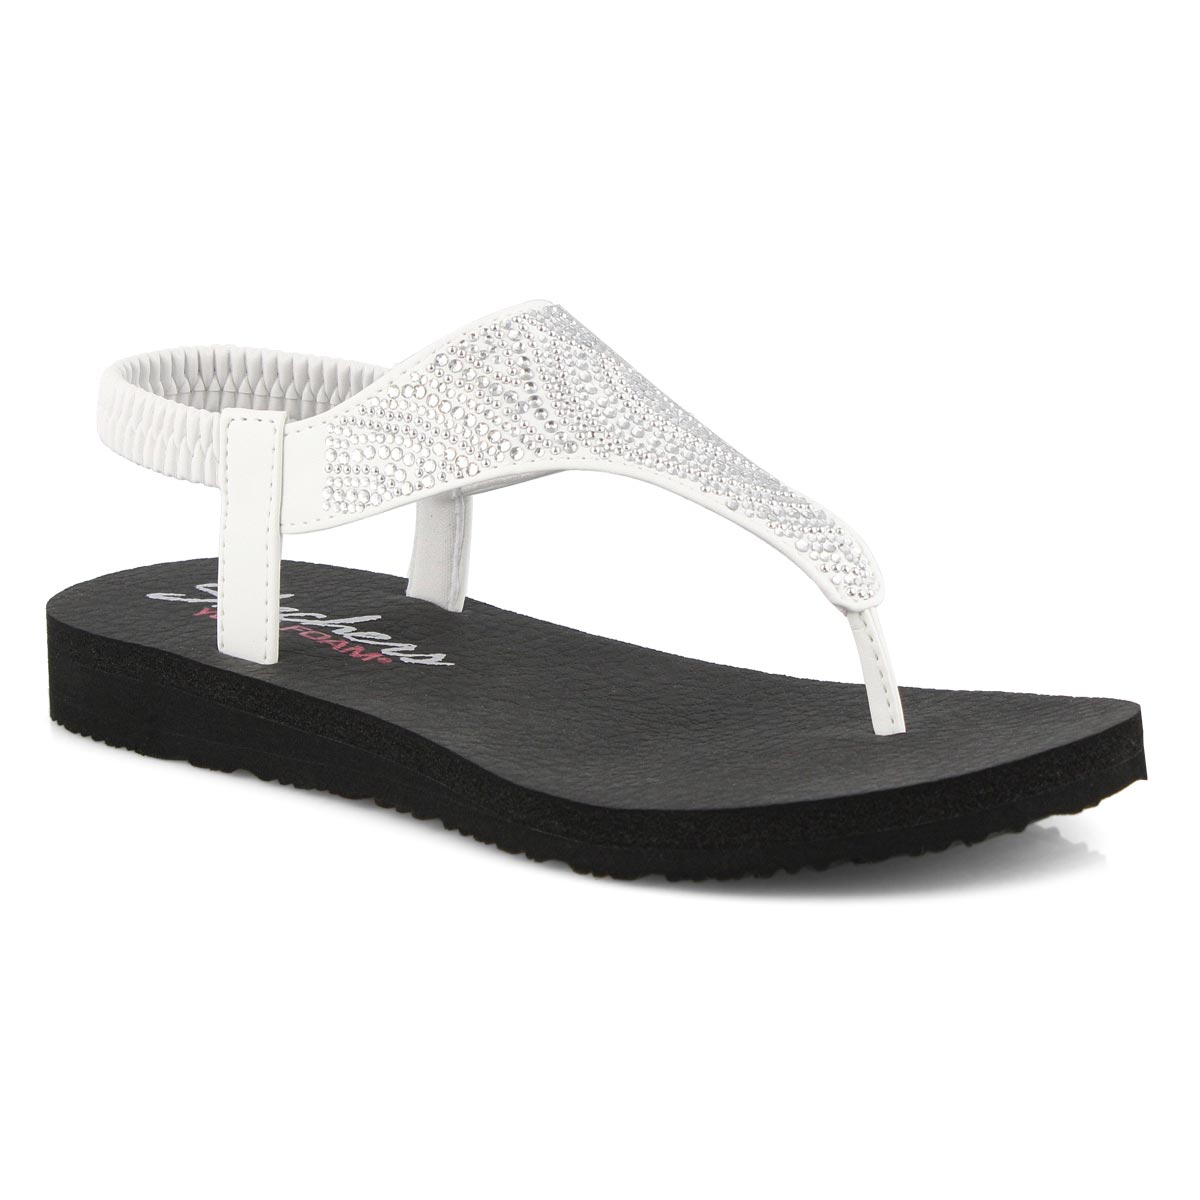 Sandale tong, Mediation, blanc,femme